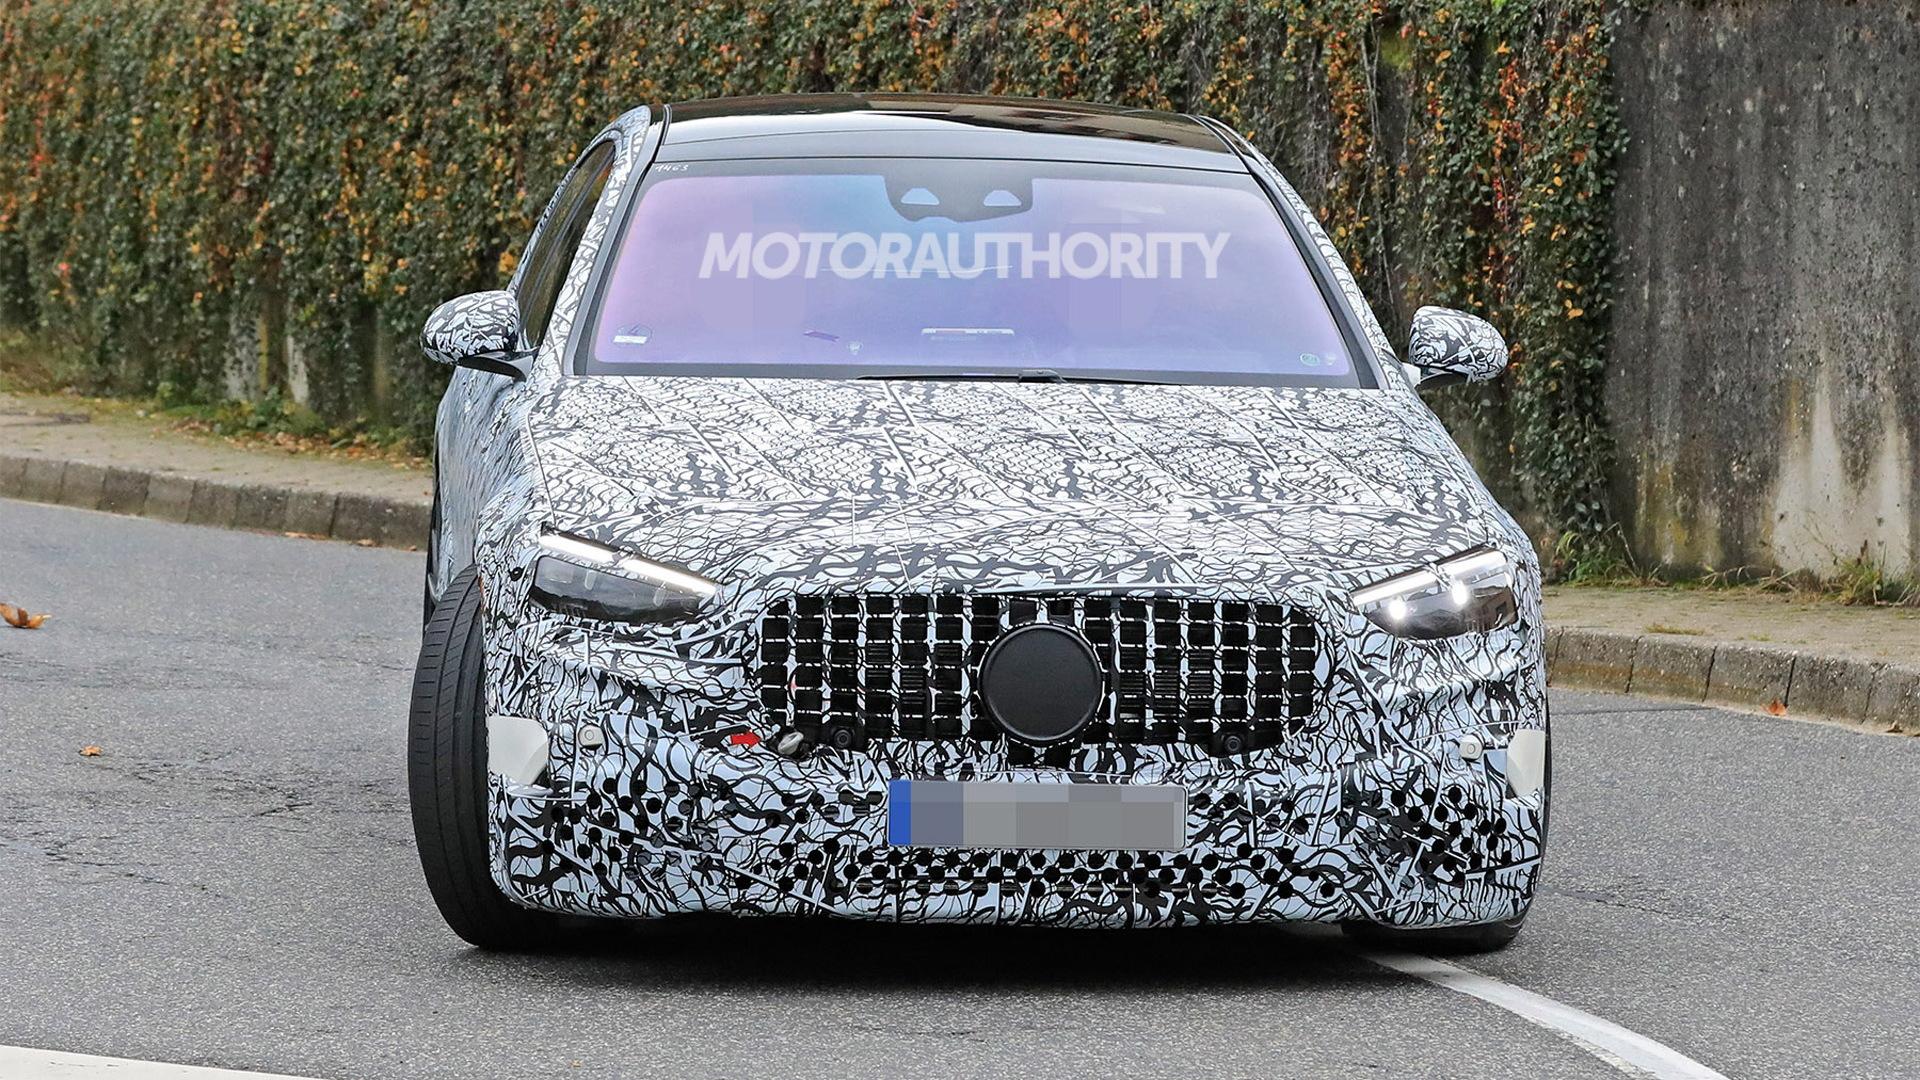 2022 Mercedes-AMG S63e spy shots - Photo credit:S. Baldauf/SB-Medien